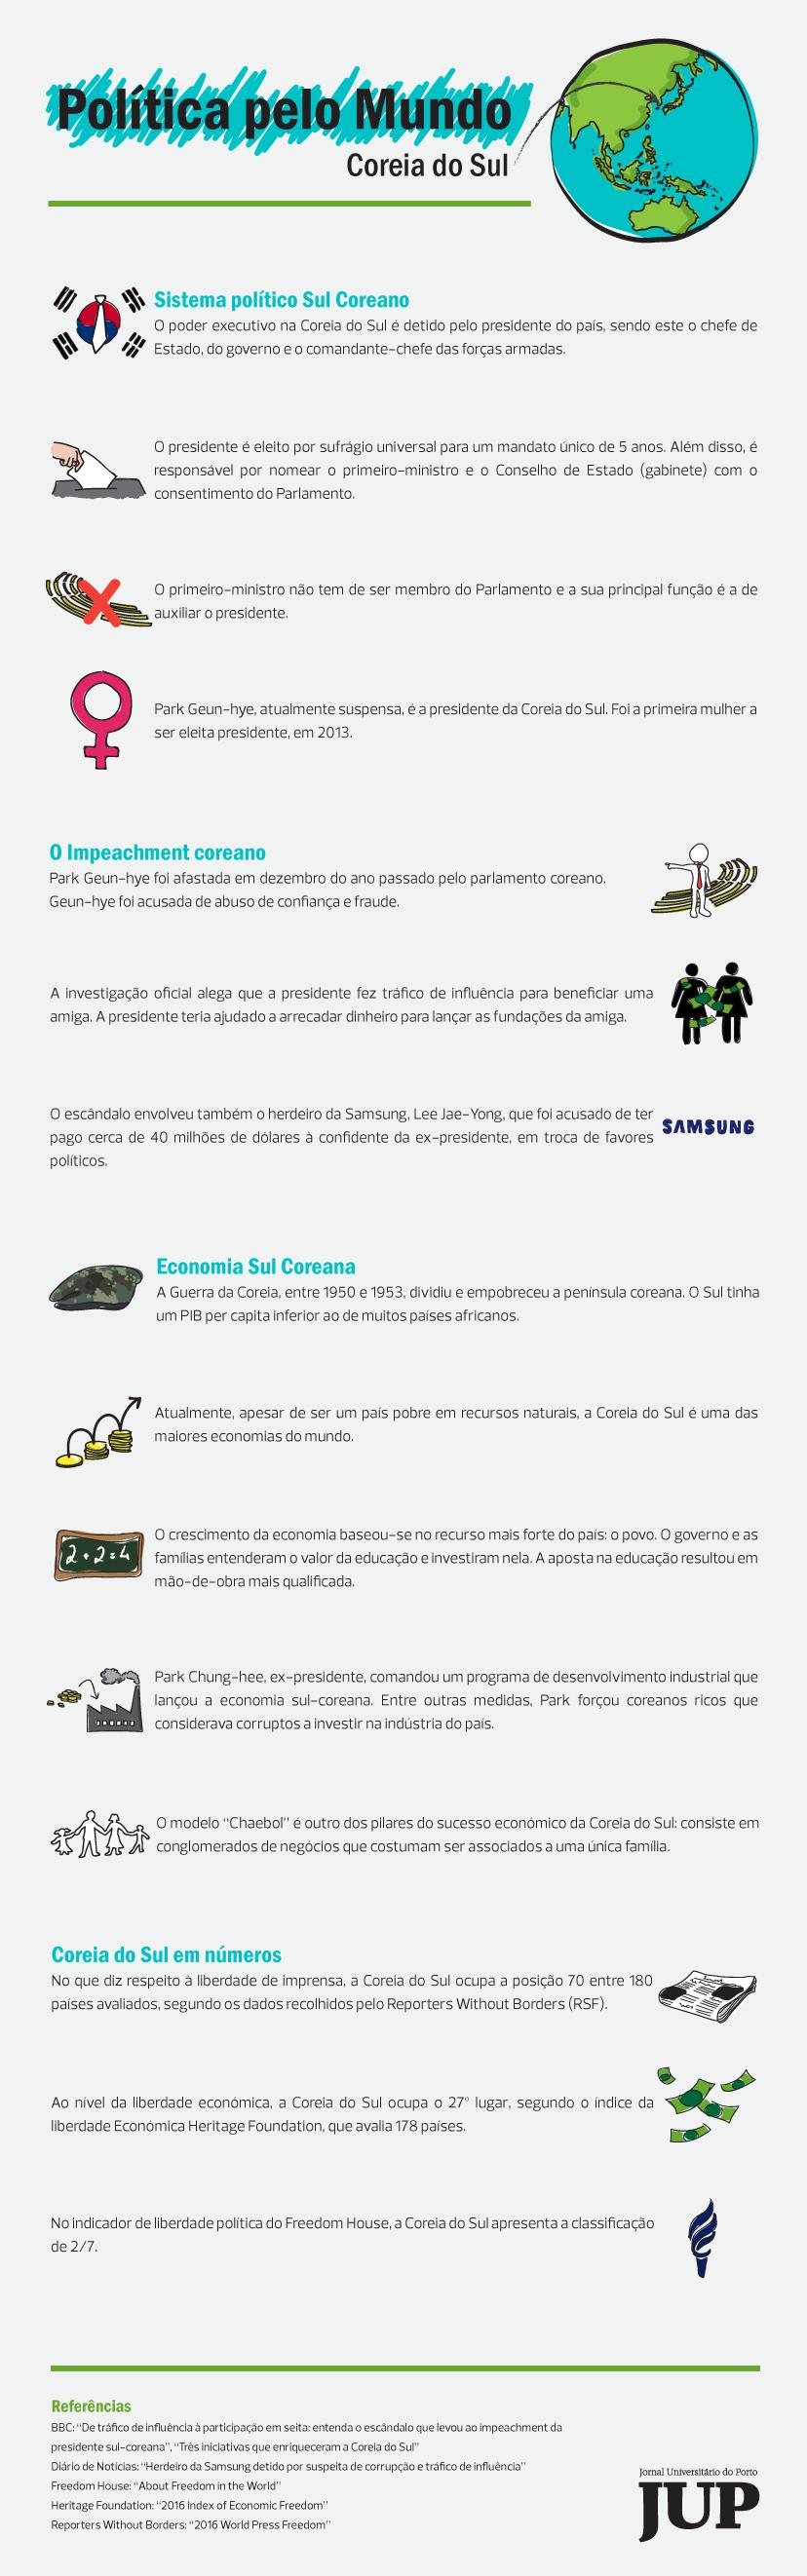 Infografia: Sara Felgueiras